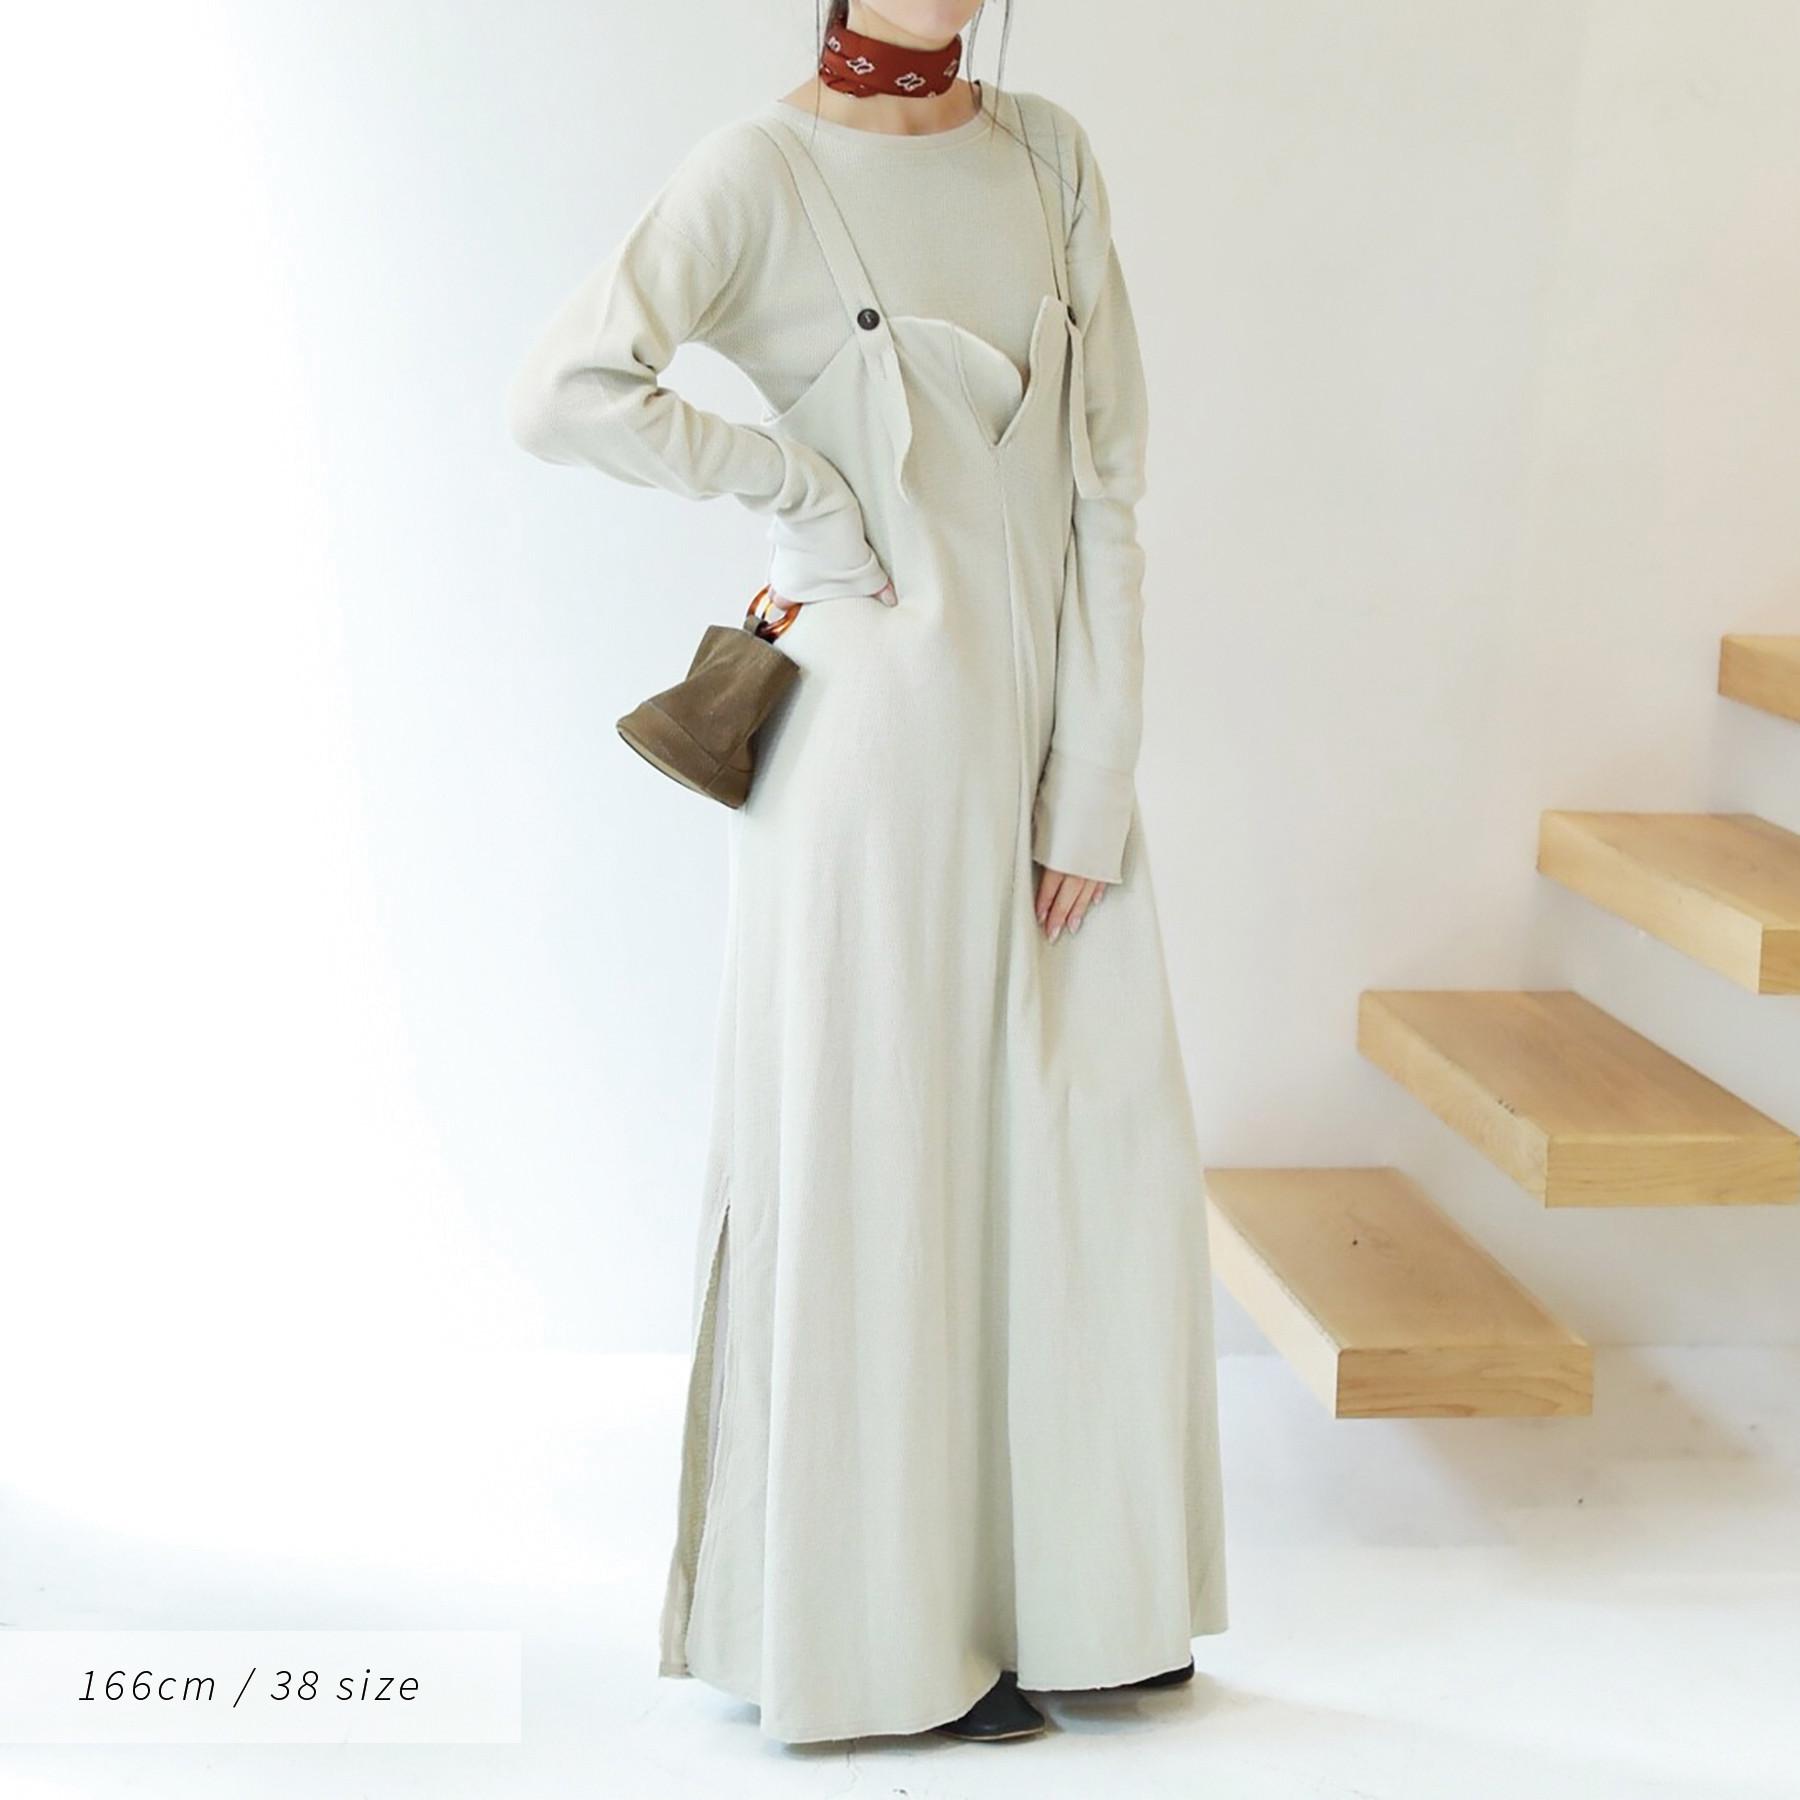 Thermal Salopette Dress